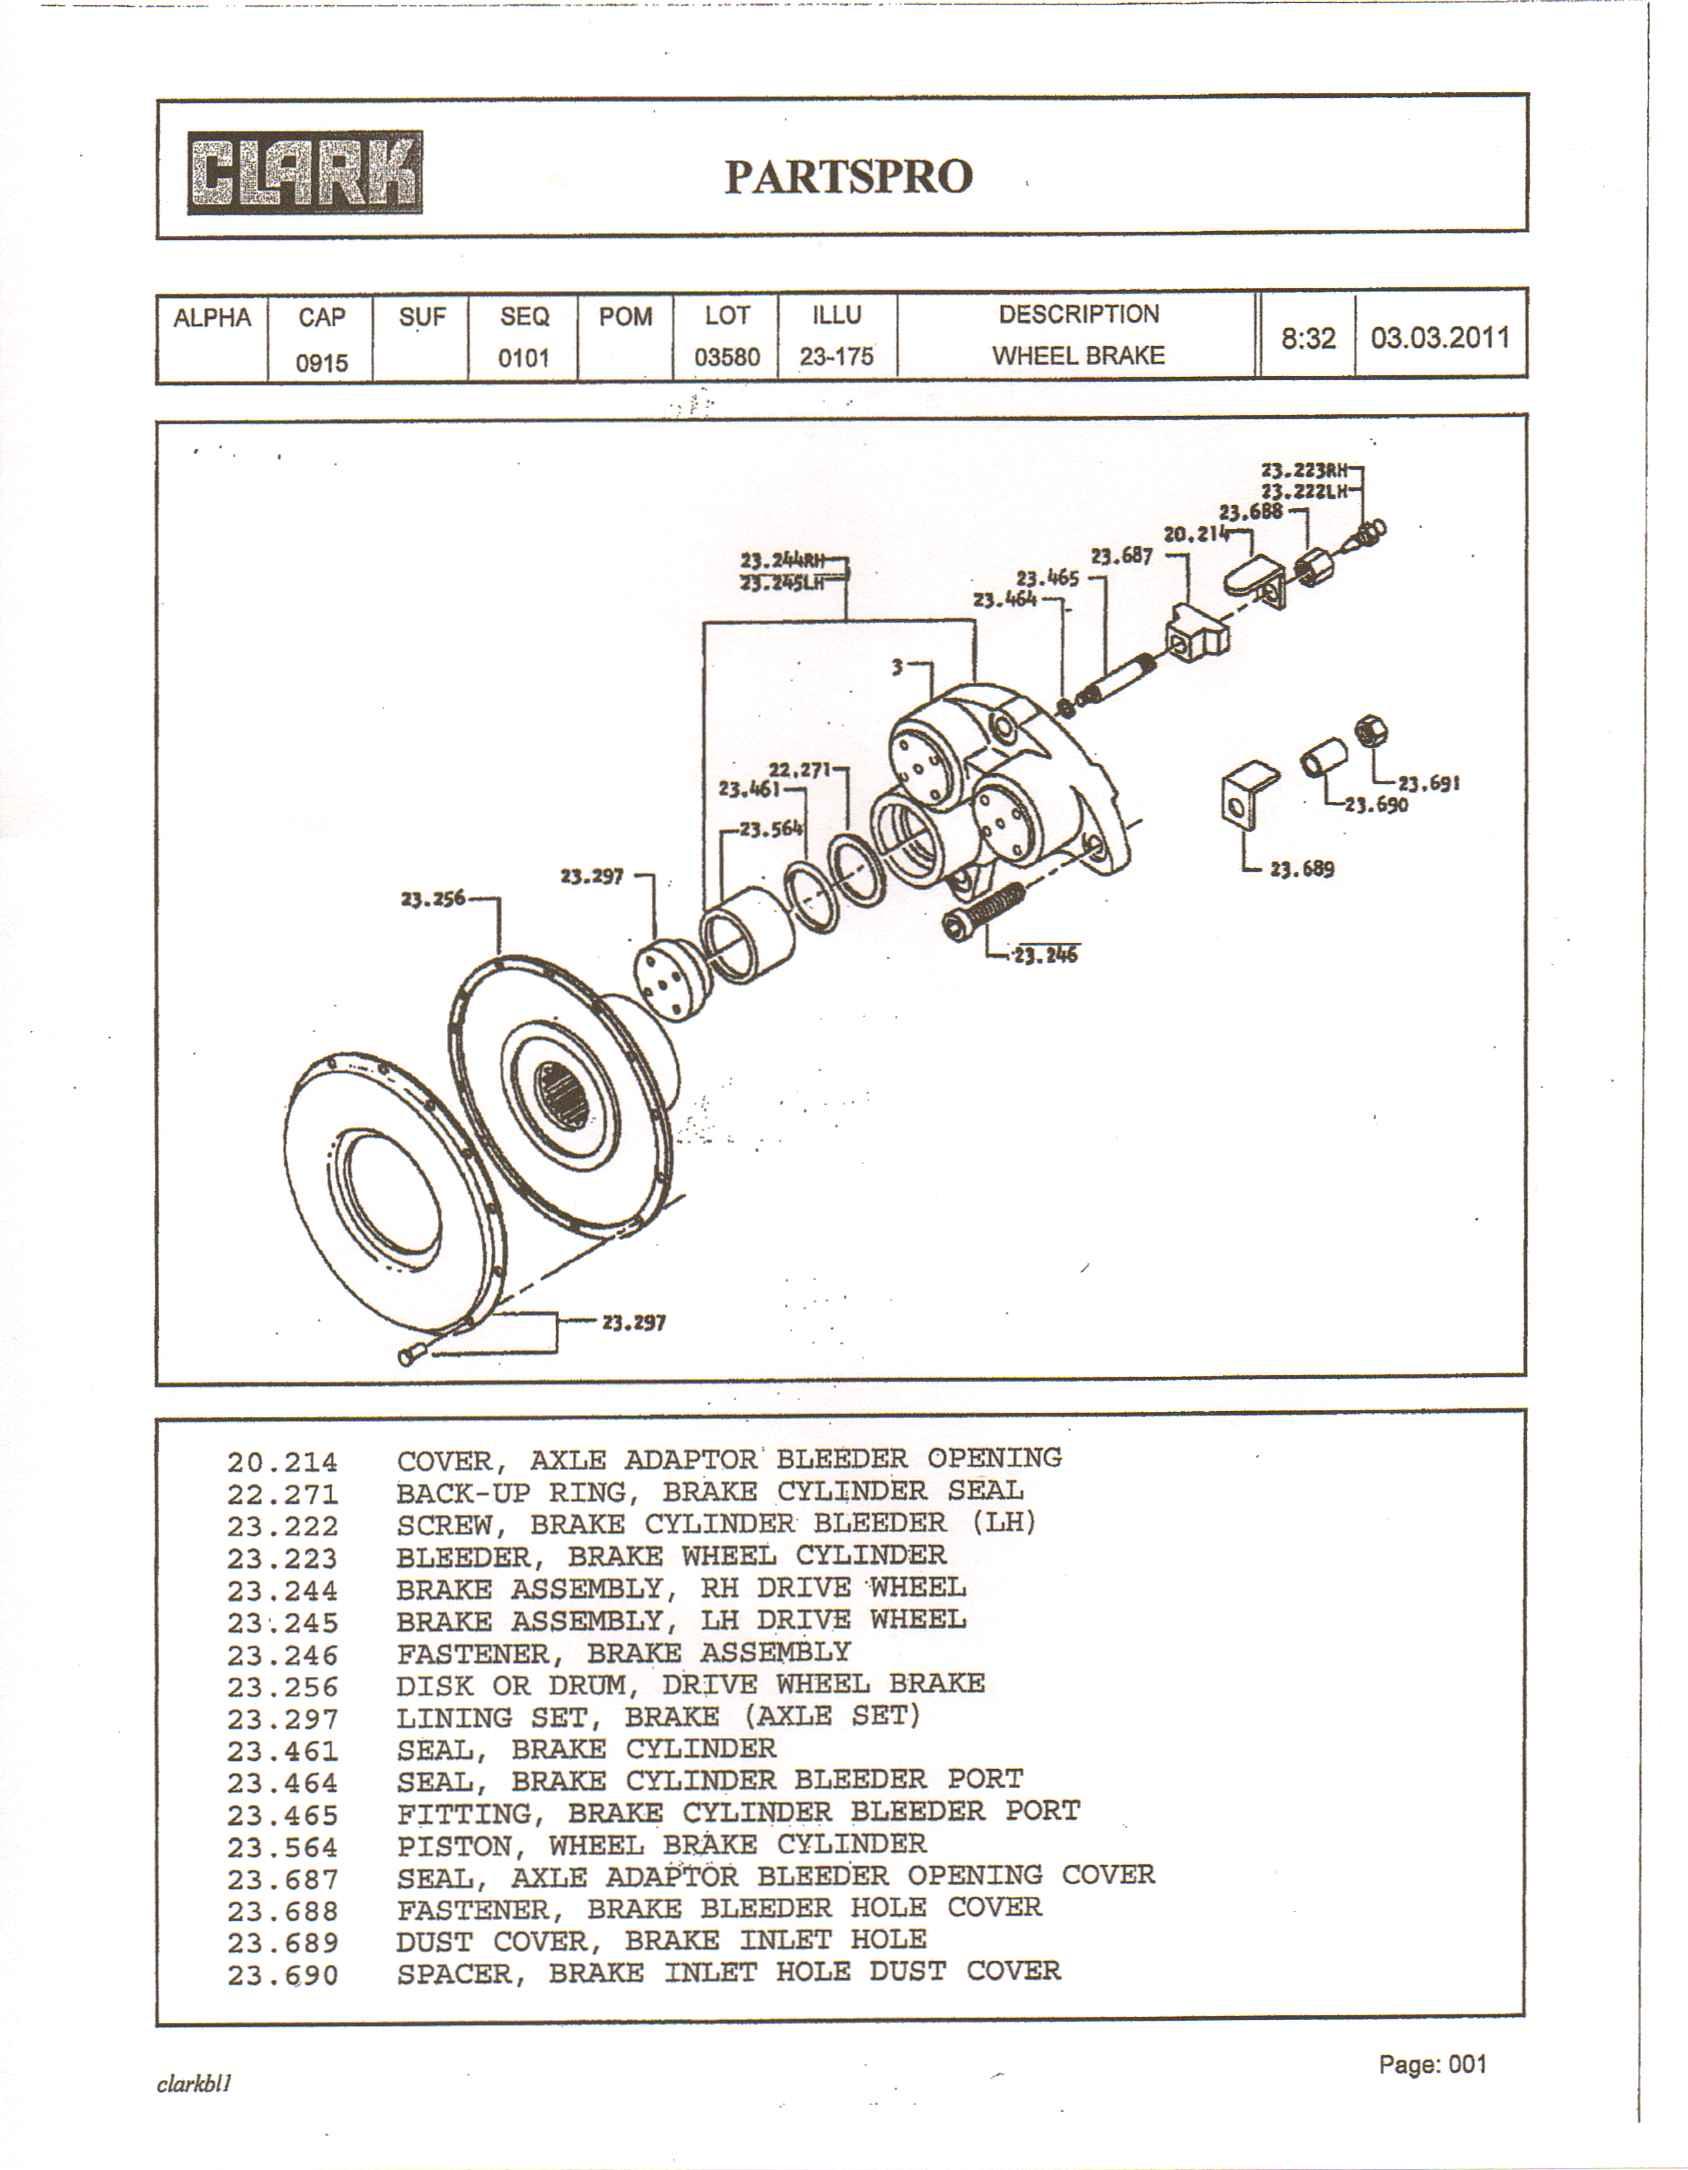 Komatsu Forklift Wiring Diagrams Library Tcm Diagram Clark C500